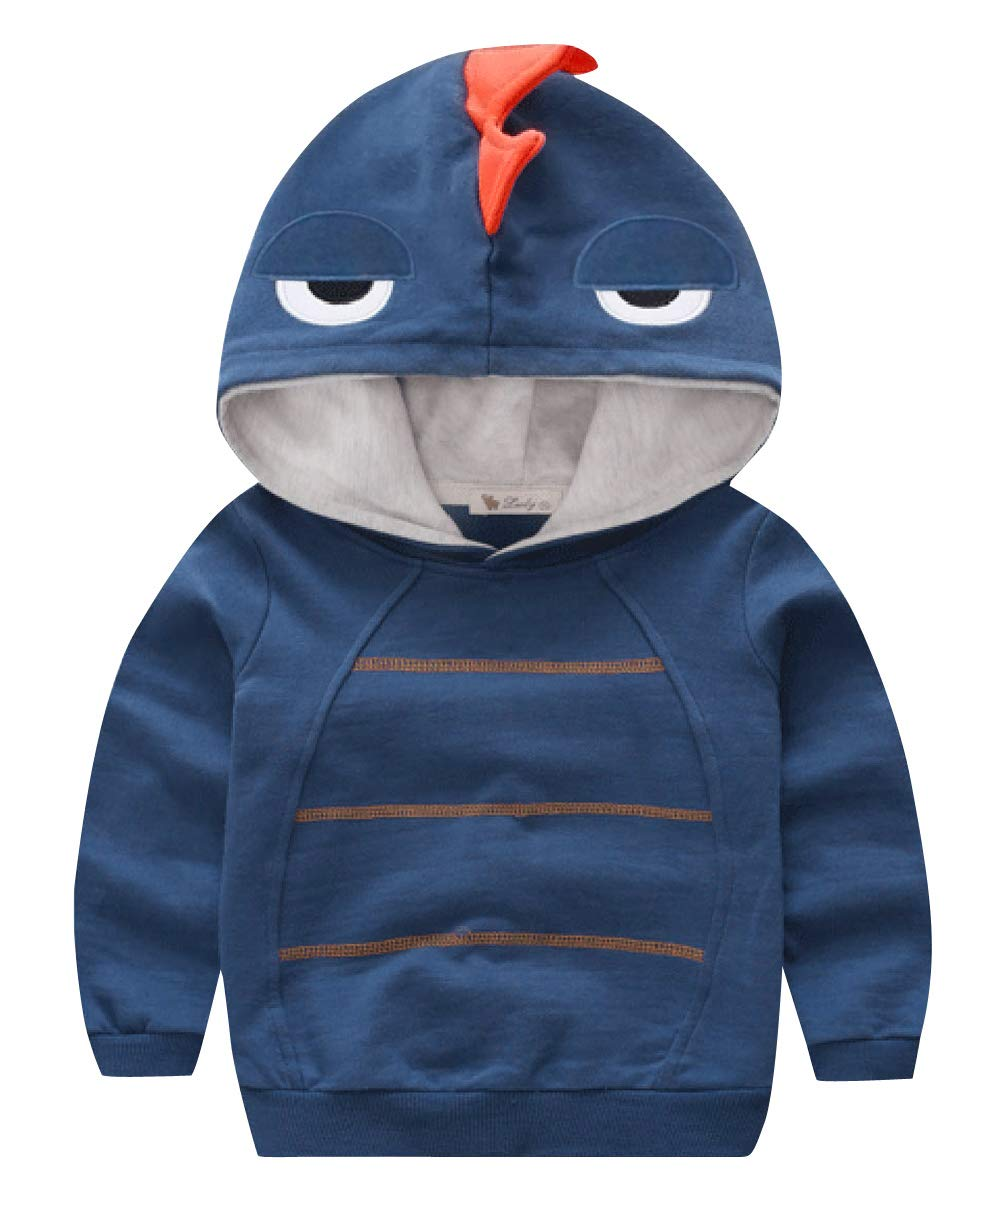 Boys Autumn Long Sleeve Strip Dinosaur Hoodie Toddler Outwear Clothes Aivtalk